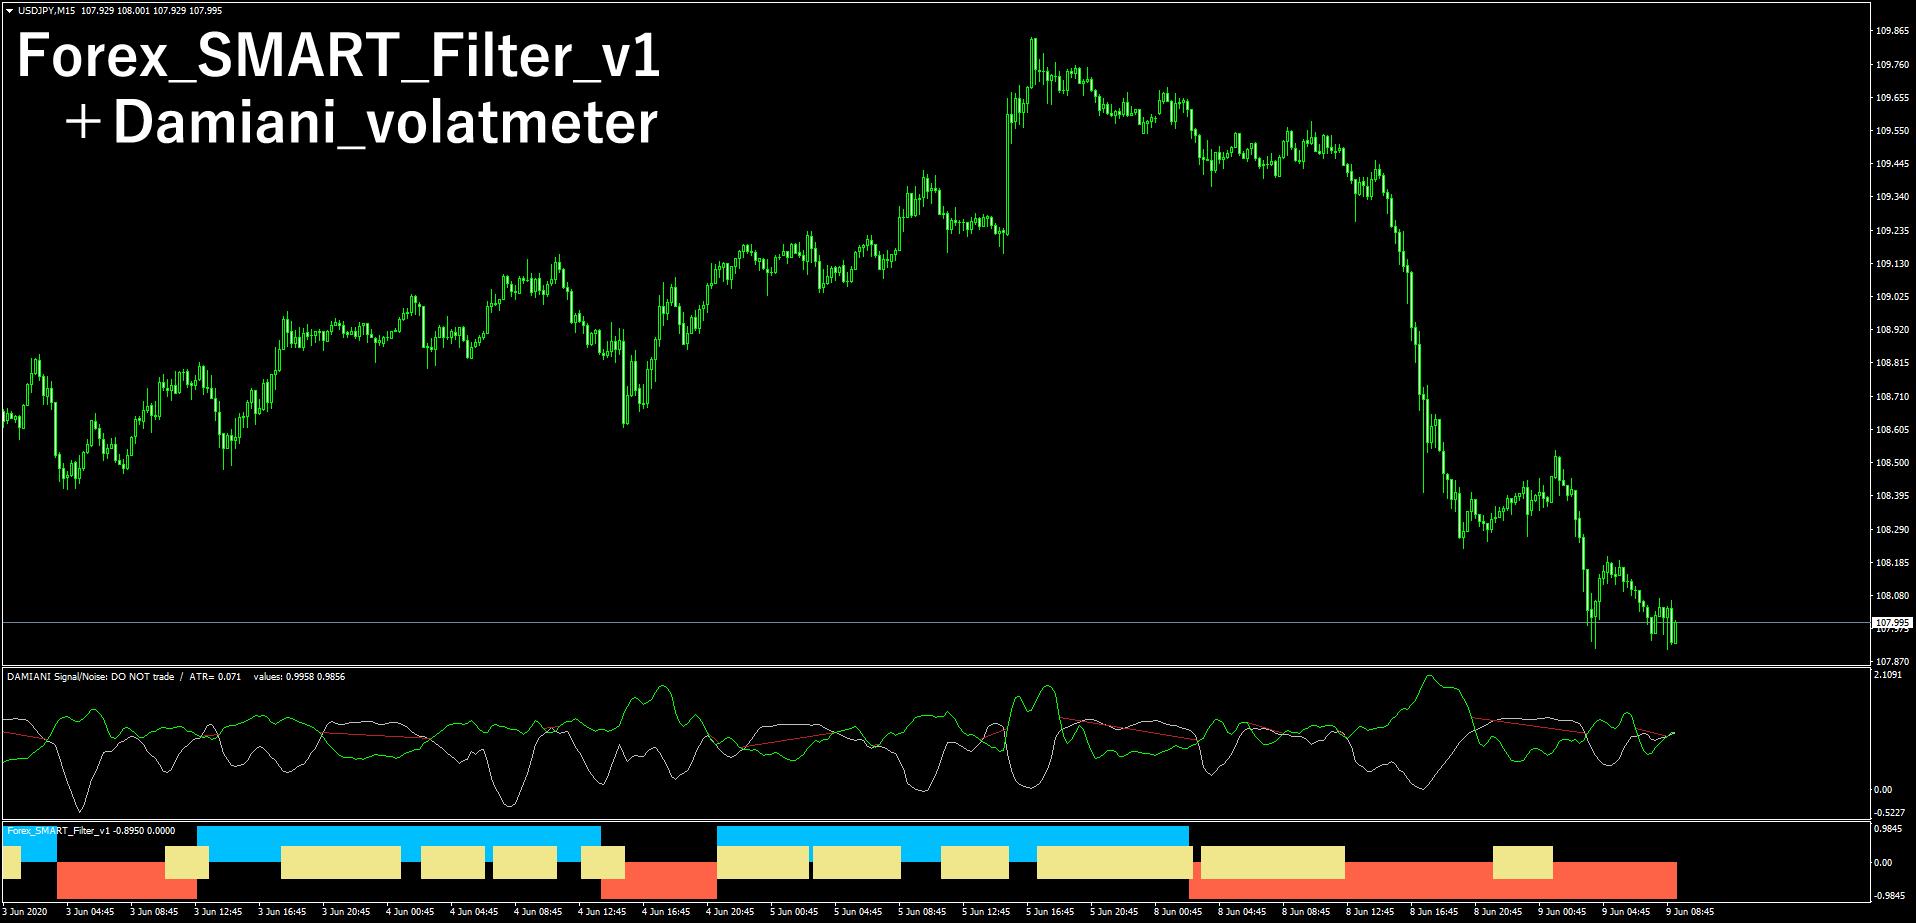 「Damiani_volatmeter」と「Forex_SMART_Filter_v1」の2つを表示させたドル円15分足チャート